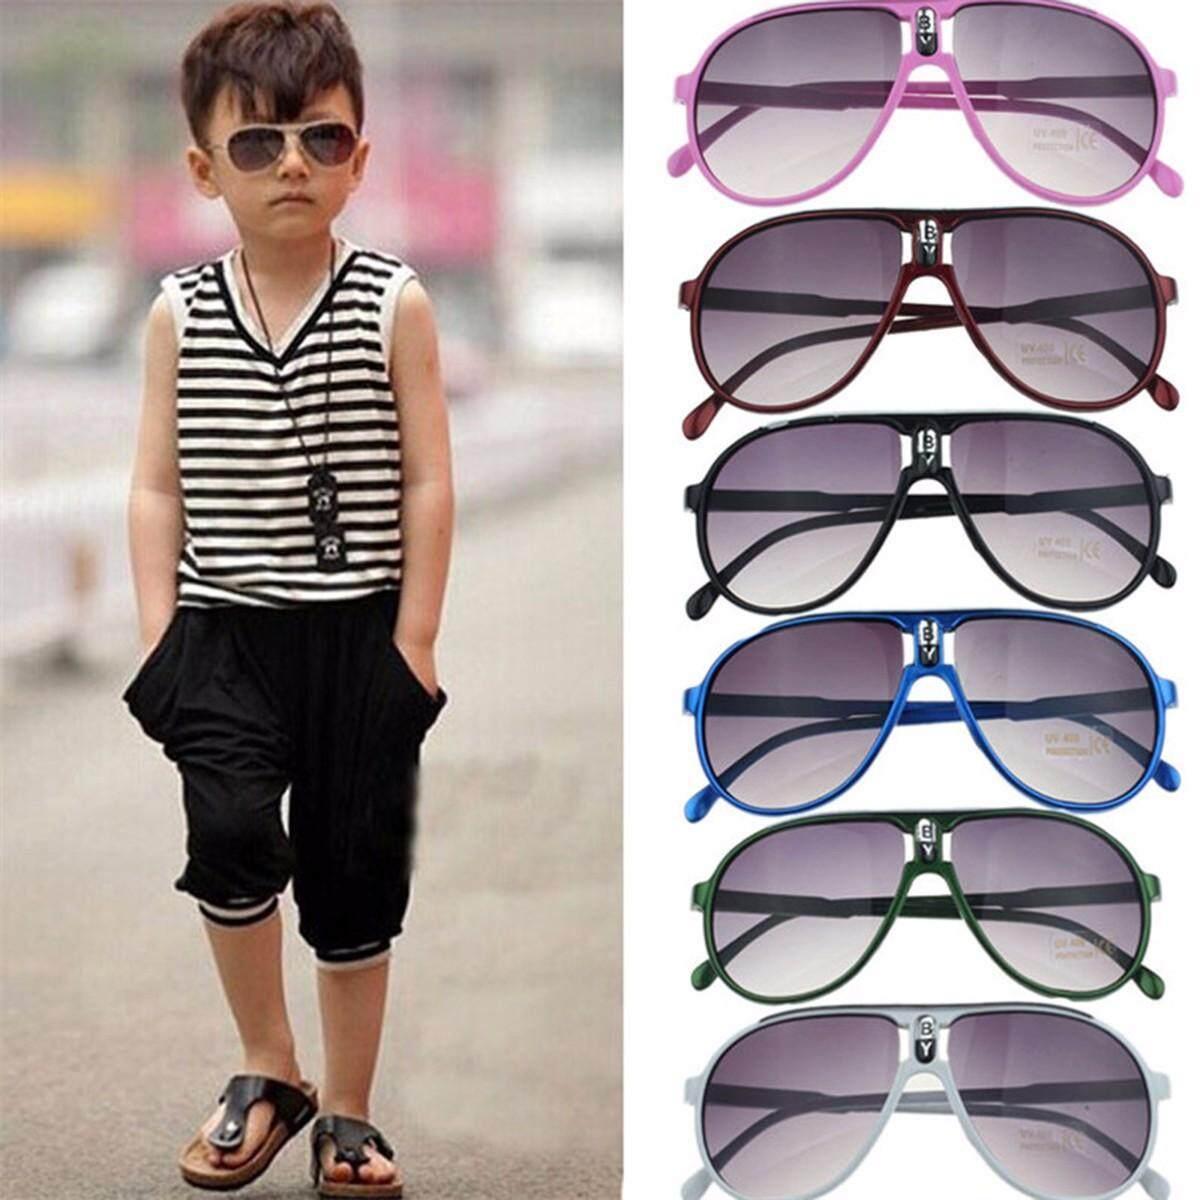 a65b1f2f51 Fashion Children Sunglasses Boys Girls Kids Baby Child Sun Glasses Goggles  UV400 Mirror Glasses(6 Colors)